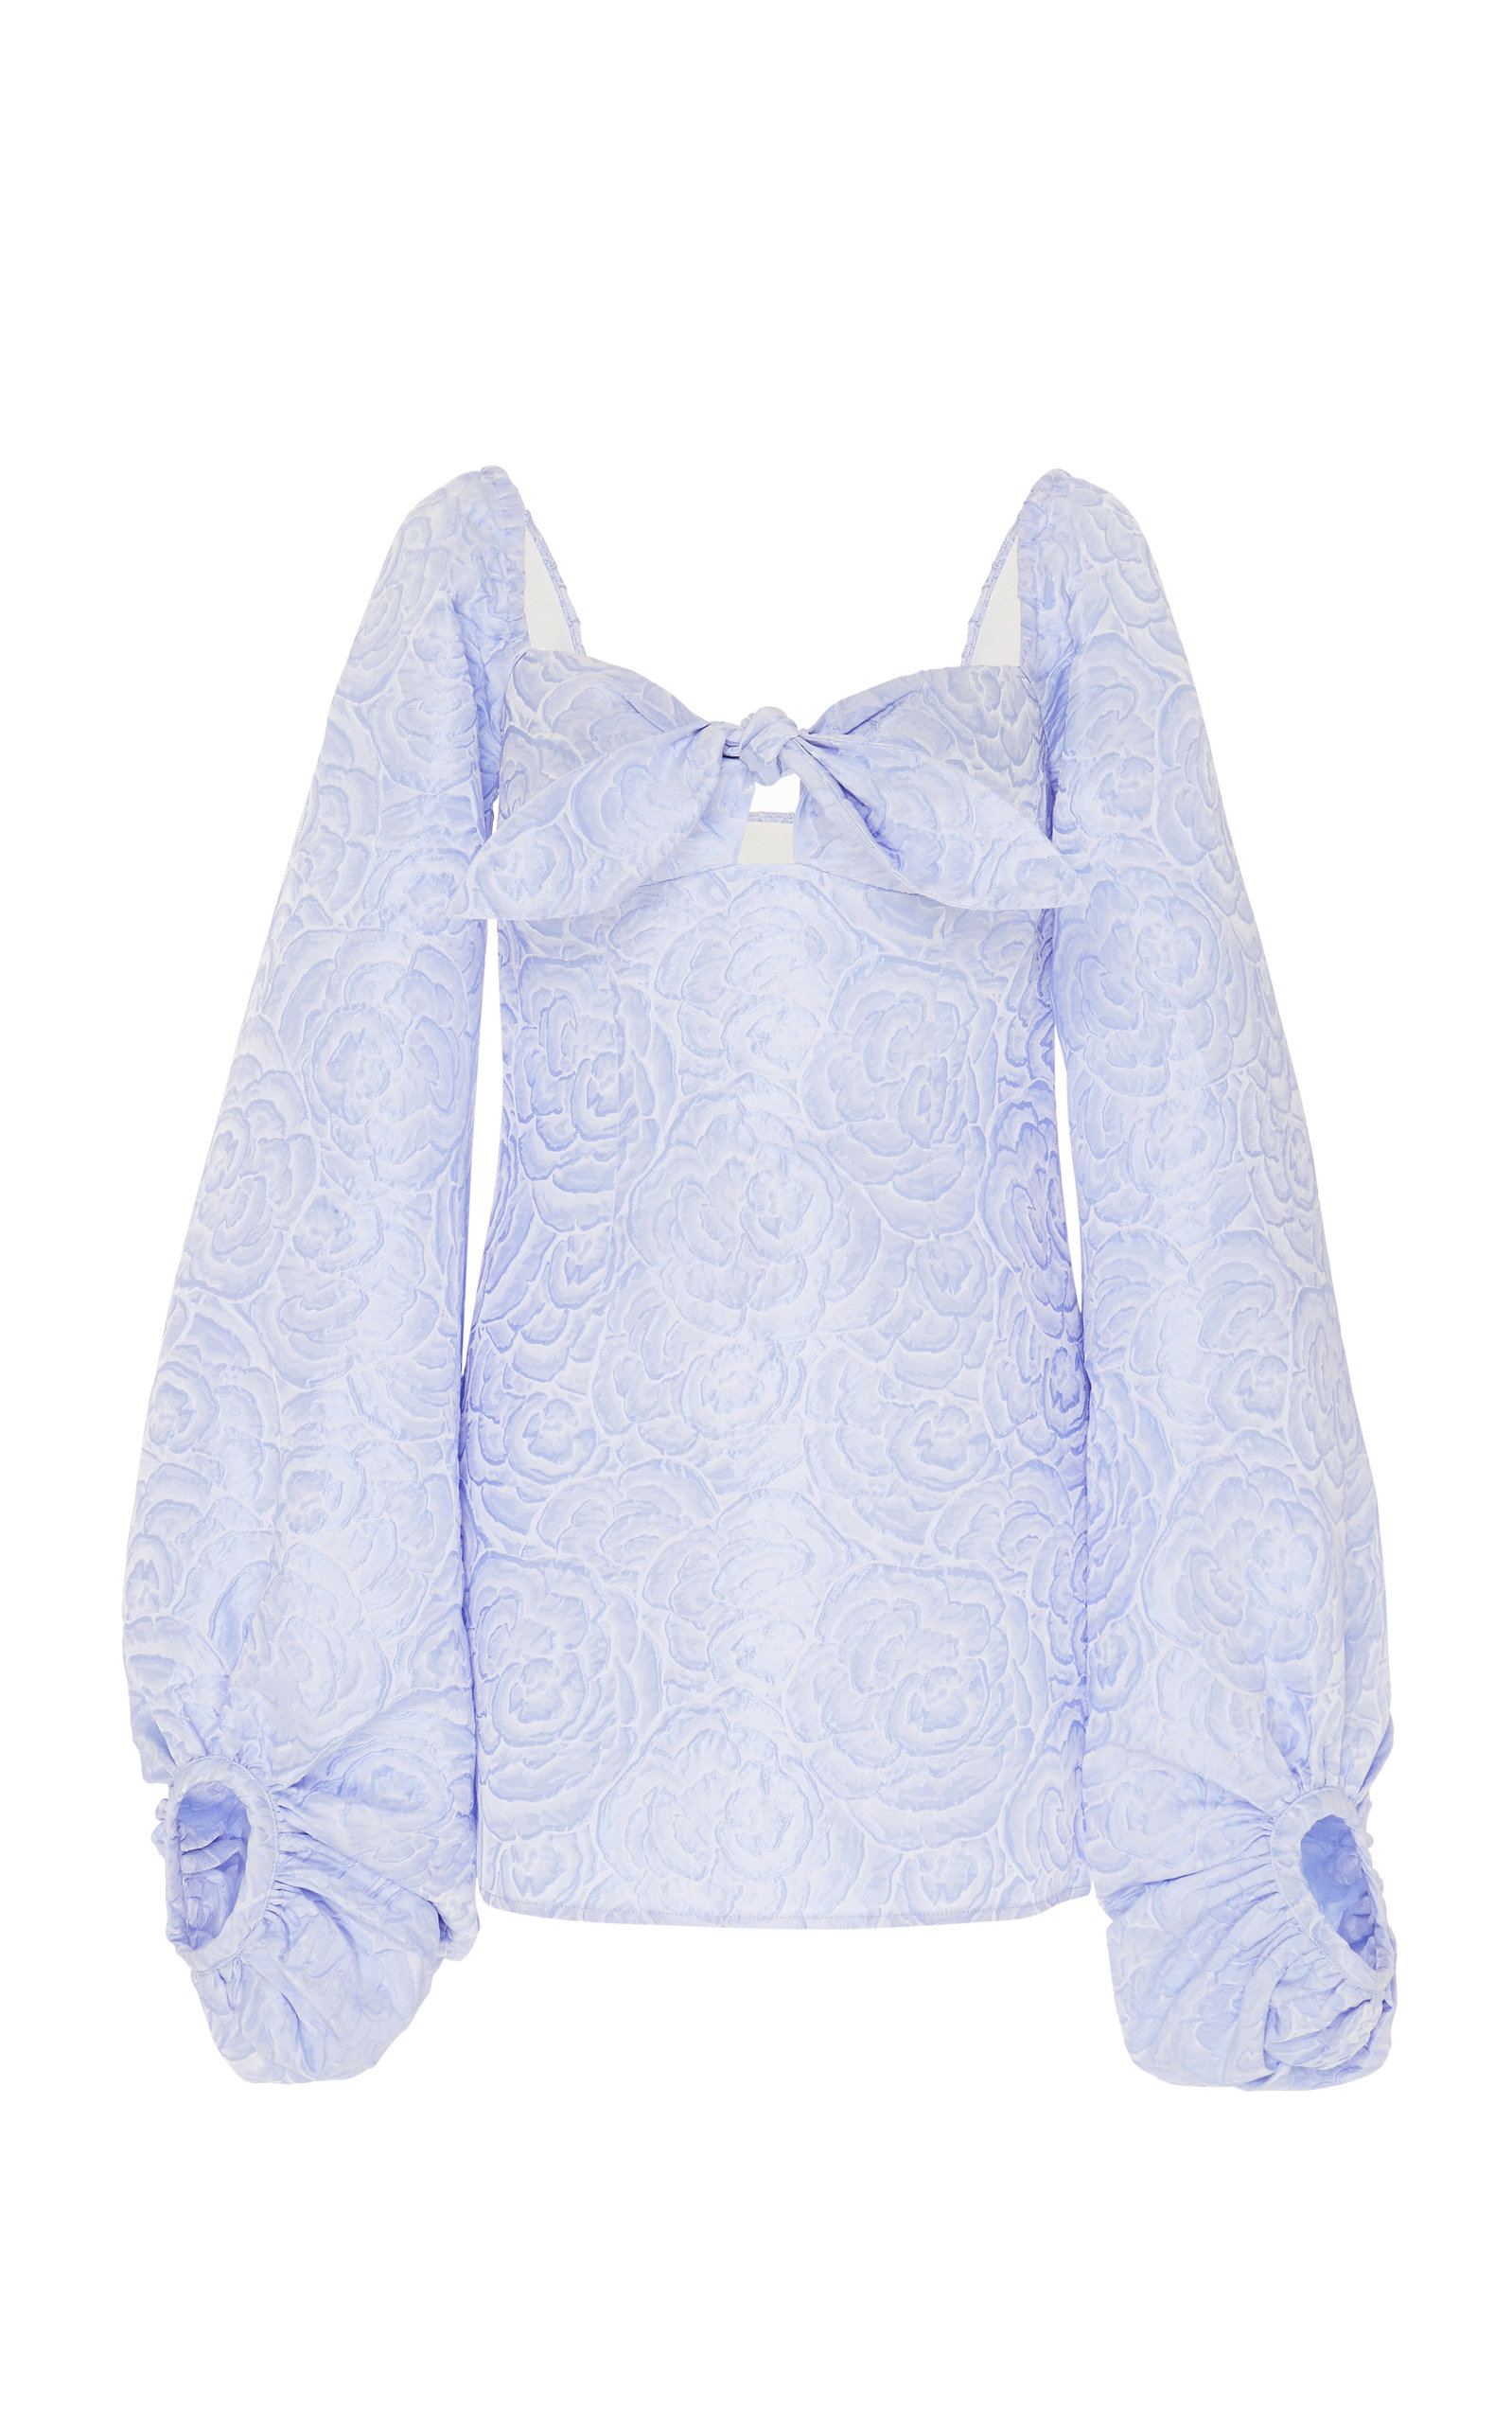 Buy Atoir Heavy Hearts Jacquard Mini Dress online, shop Atoir at the best price